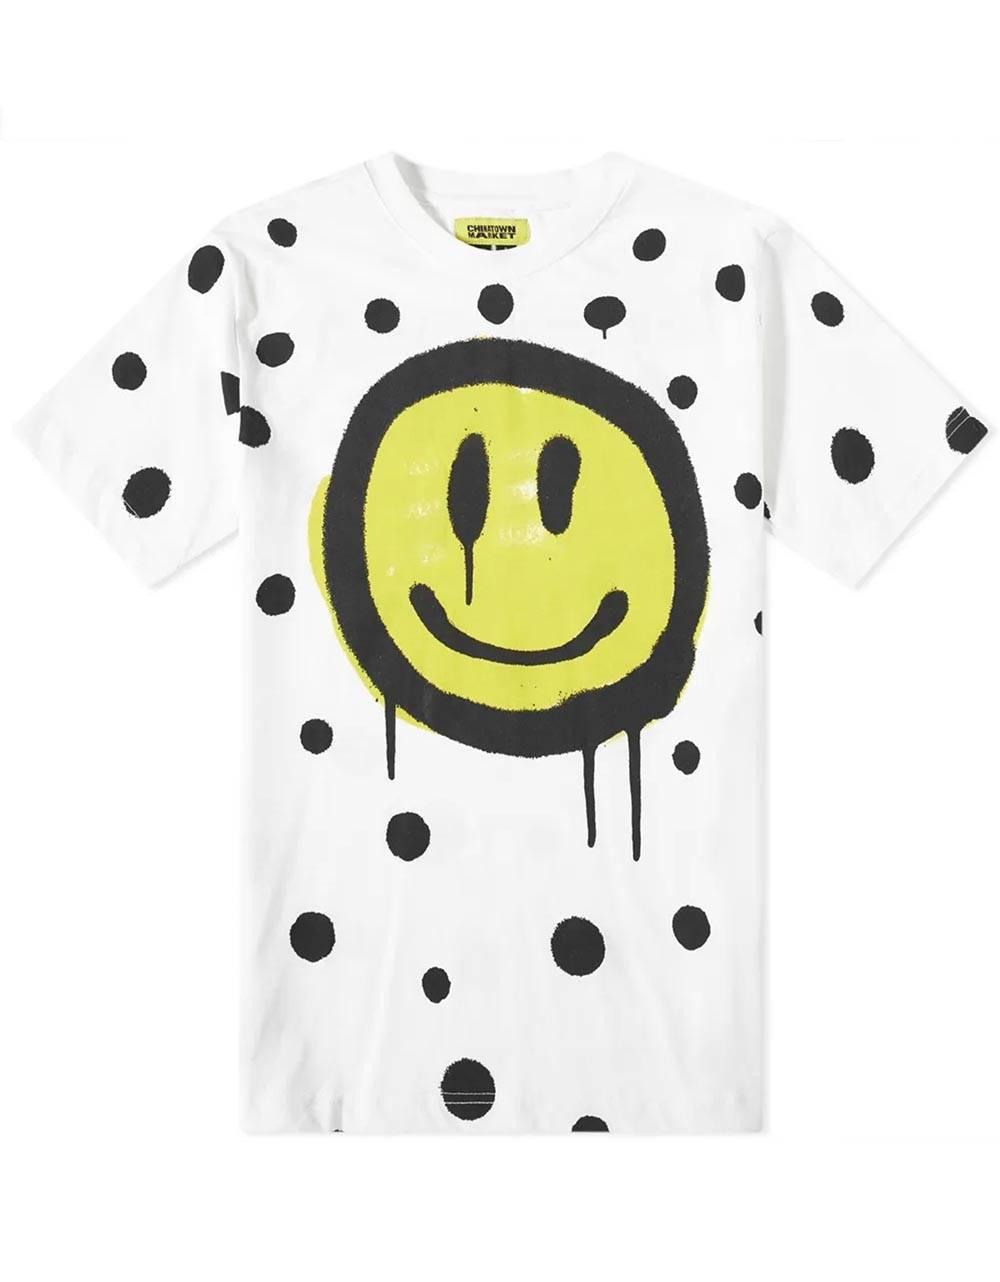 ChinaTown Market Smiley vandal tee - white Chinatown Market T-shirt 65,00€